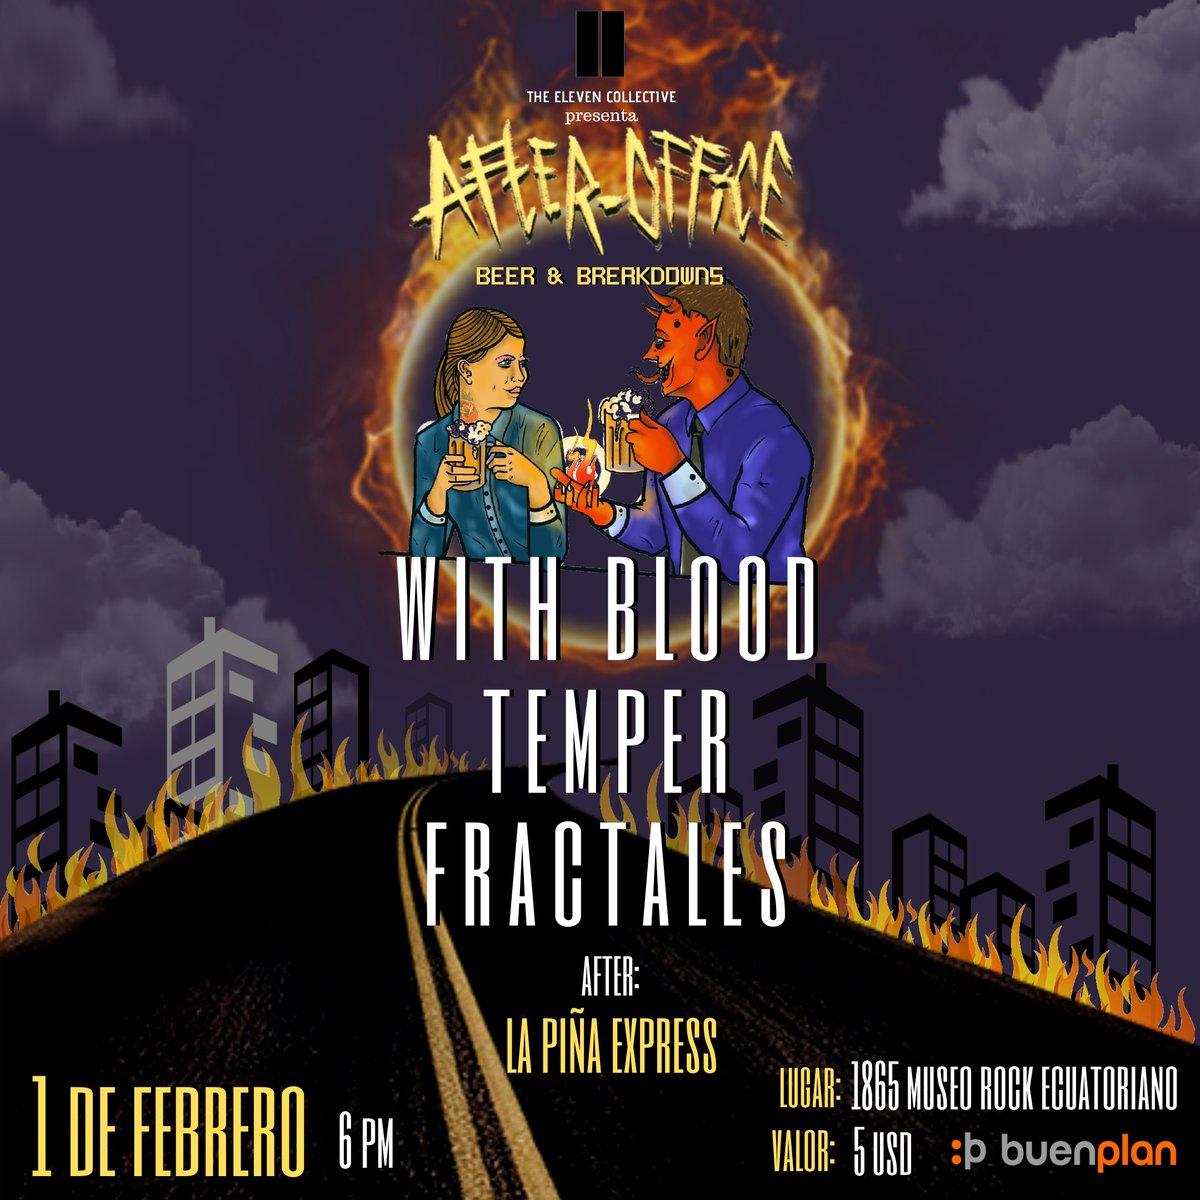 1 de febrero!  @1865MuseoRockEc #Quito #metalcore https://t.co/3DPaleYmkZ